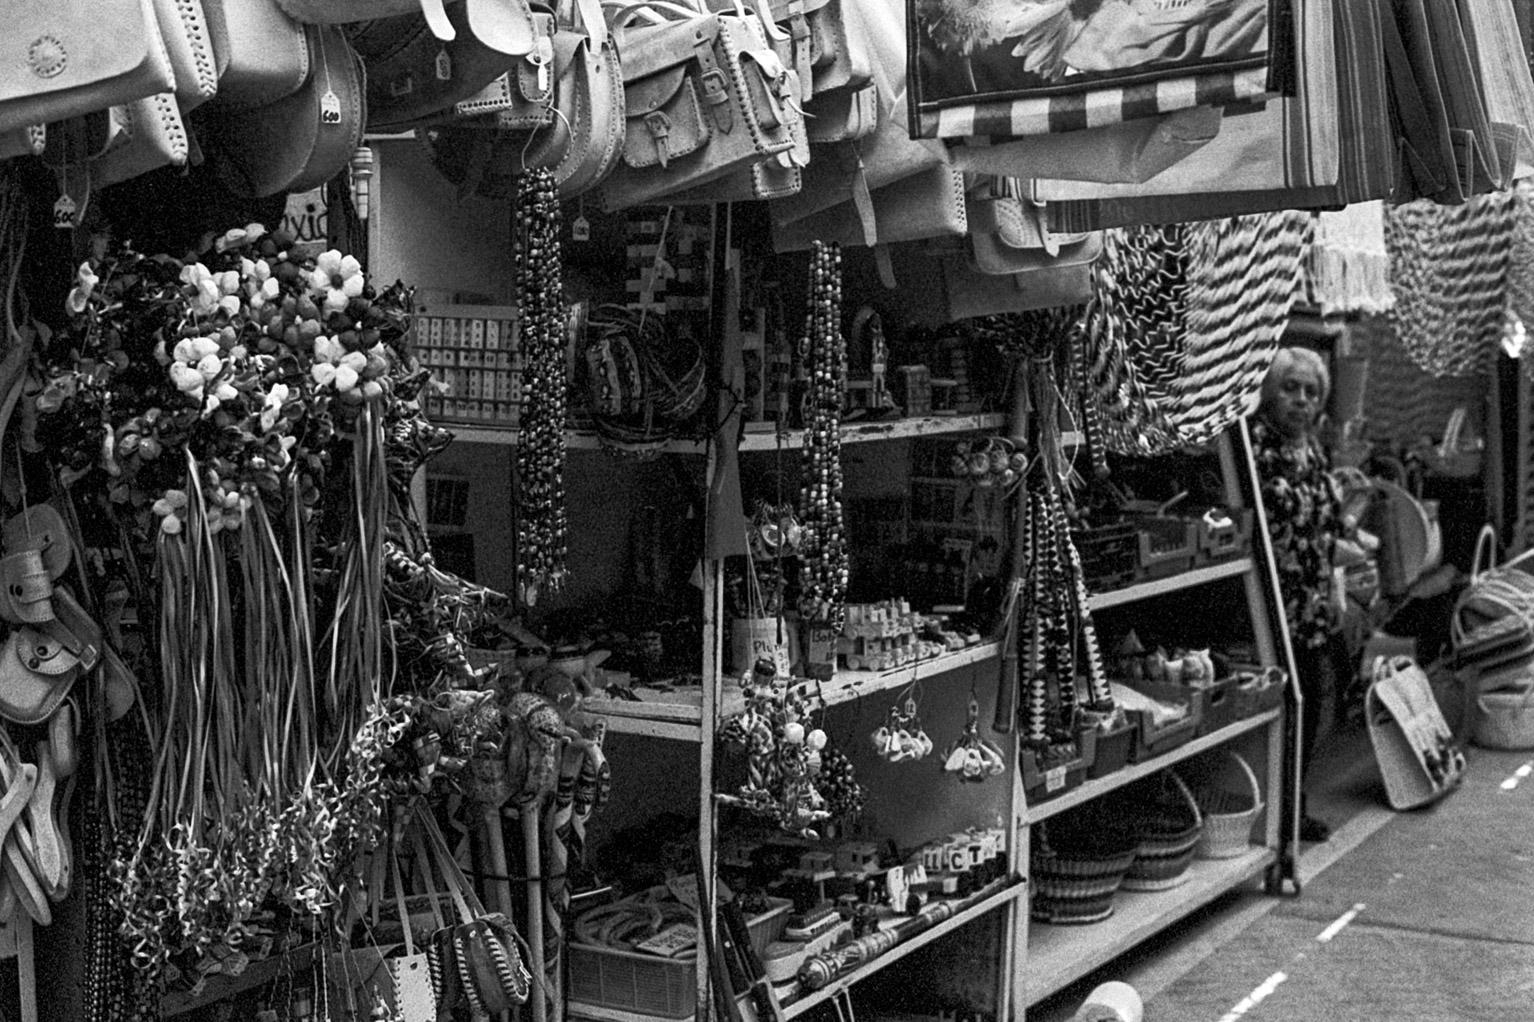 20190523_MexicoCIty_M5-KodakTrix400_031-Edit.jpg